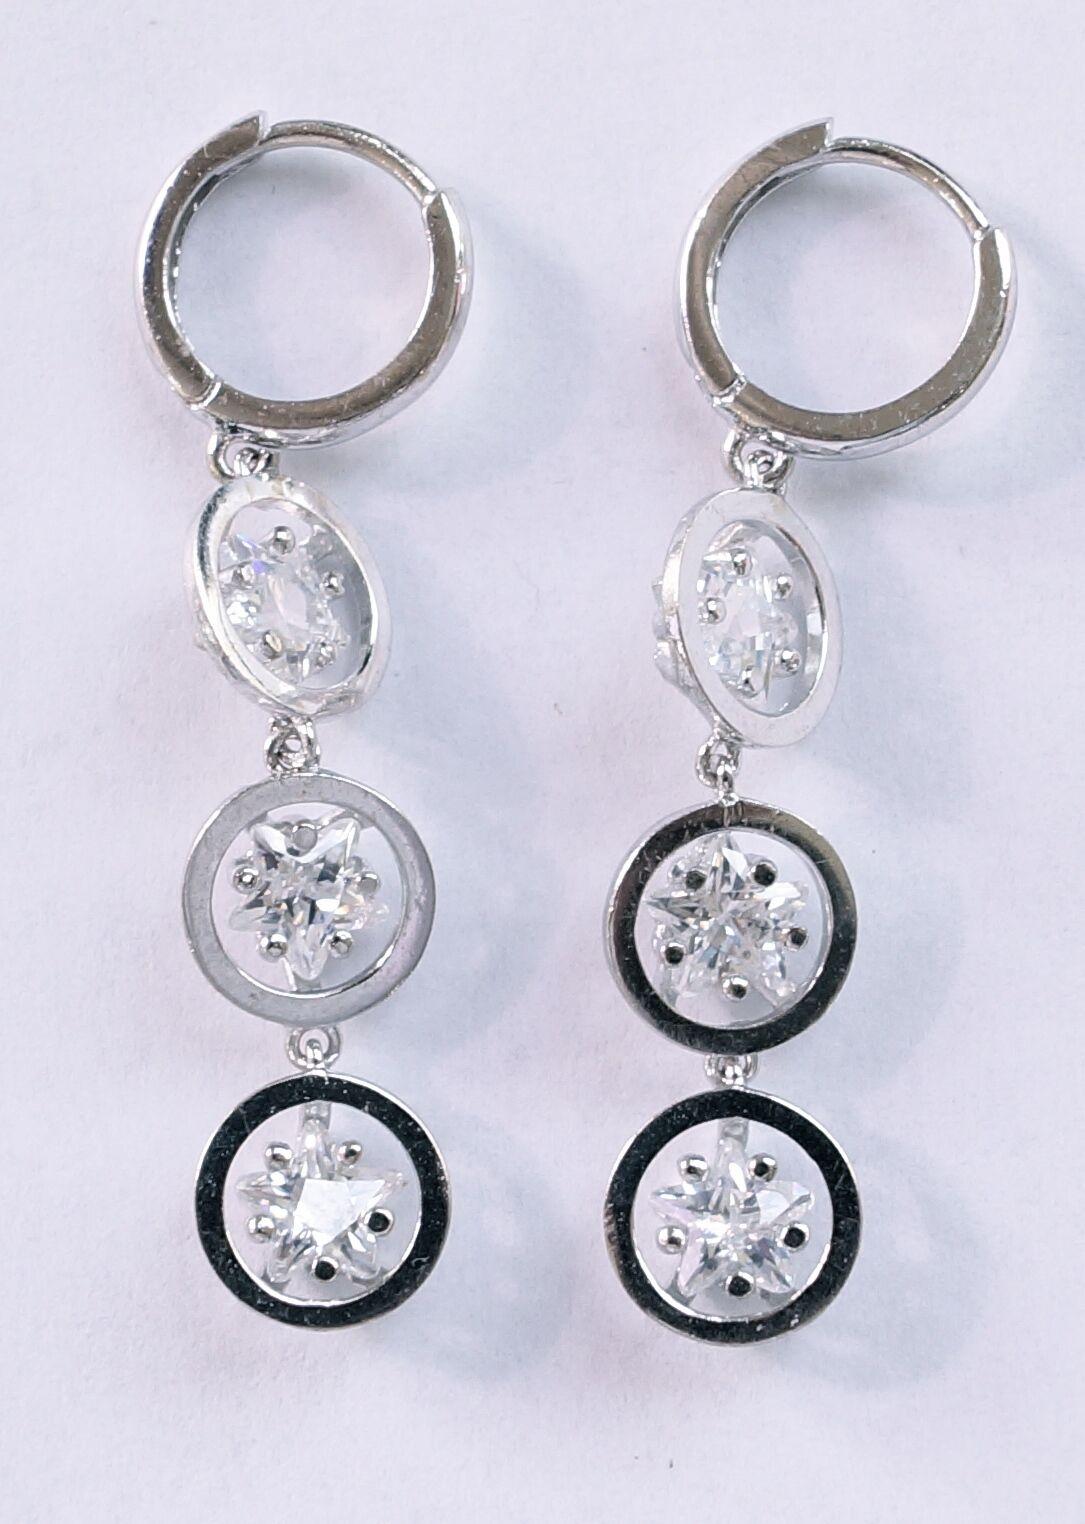 14k White gold Three Star Laddies Earrings